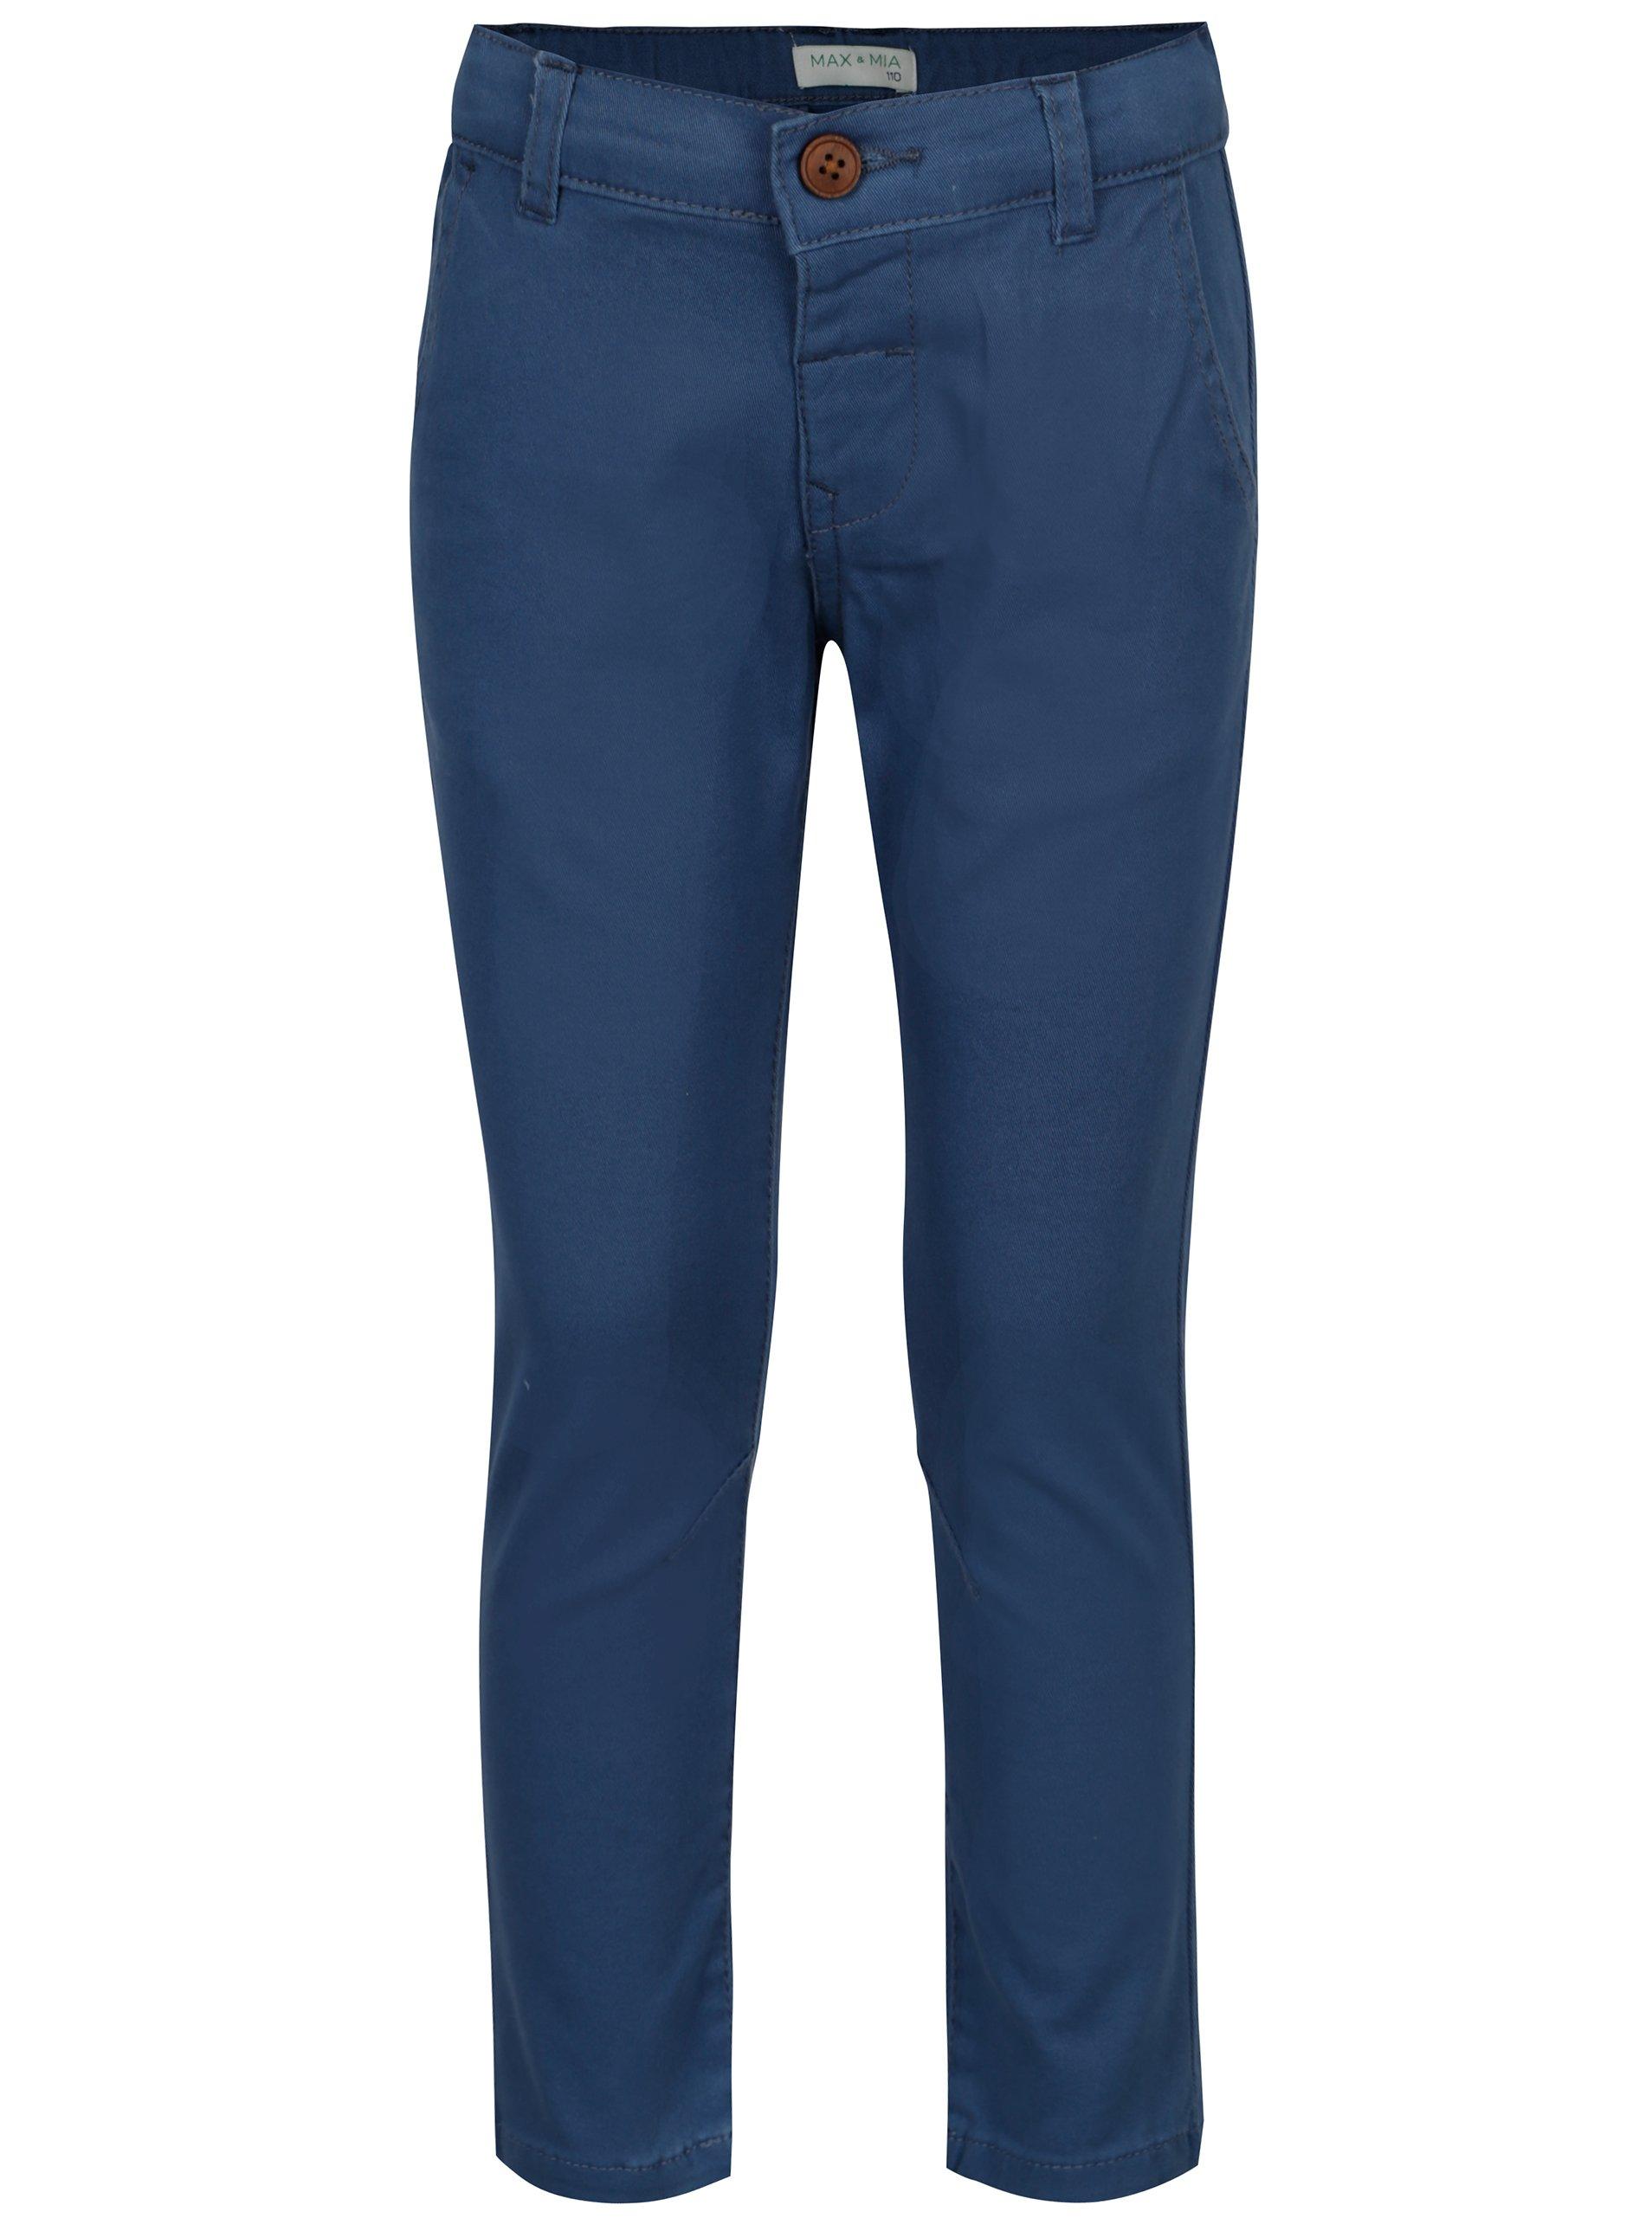 Modré chlapčenské regular chino nohavice 5.10.15.